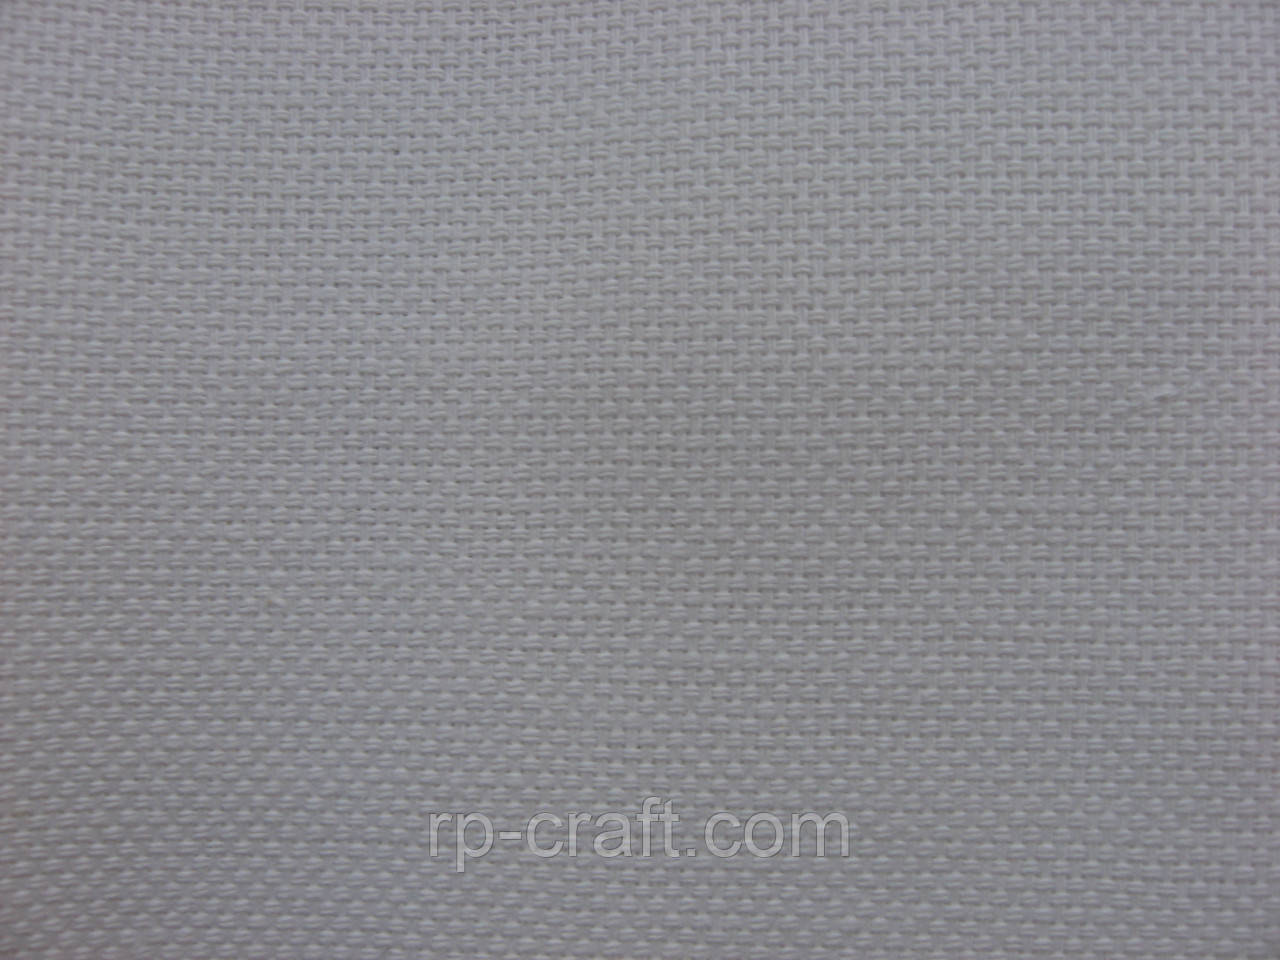 Отрез ткани для вышивки. Харданген, белый, 29х45 см